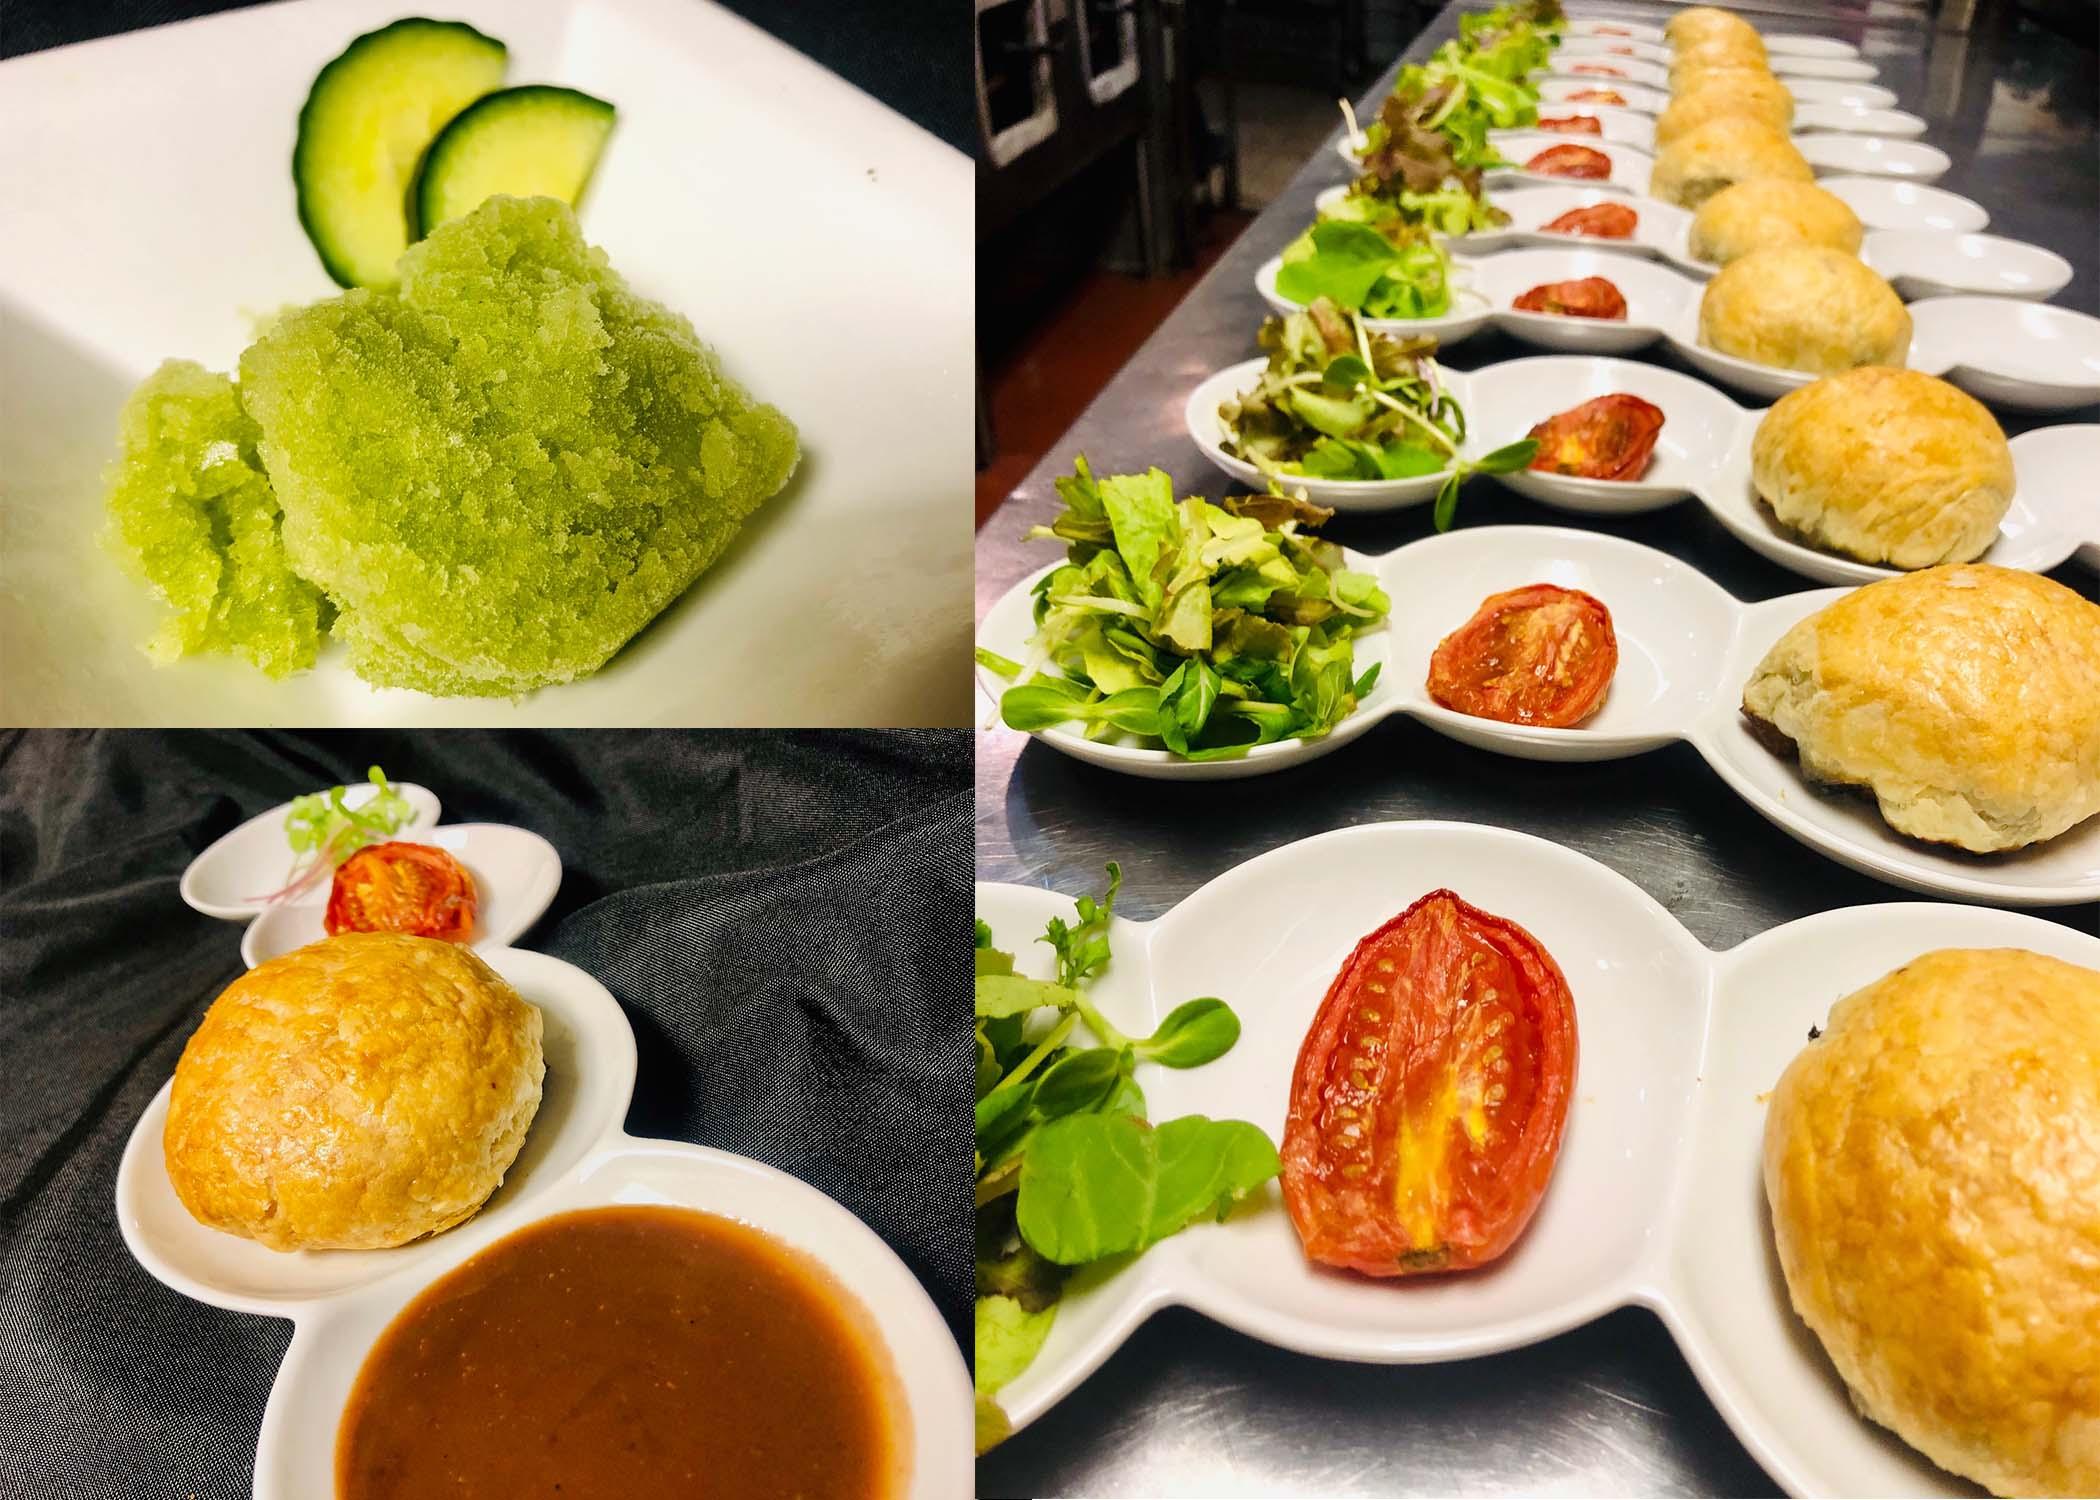 (Top Left) Intermezzo: Cucumber Lime Granita (Bottom Left and Right) Second Course: Portobello Wellington With Mushroom Herb Jus